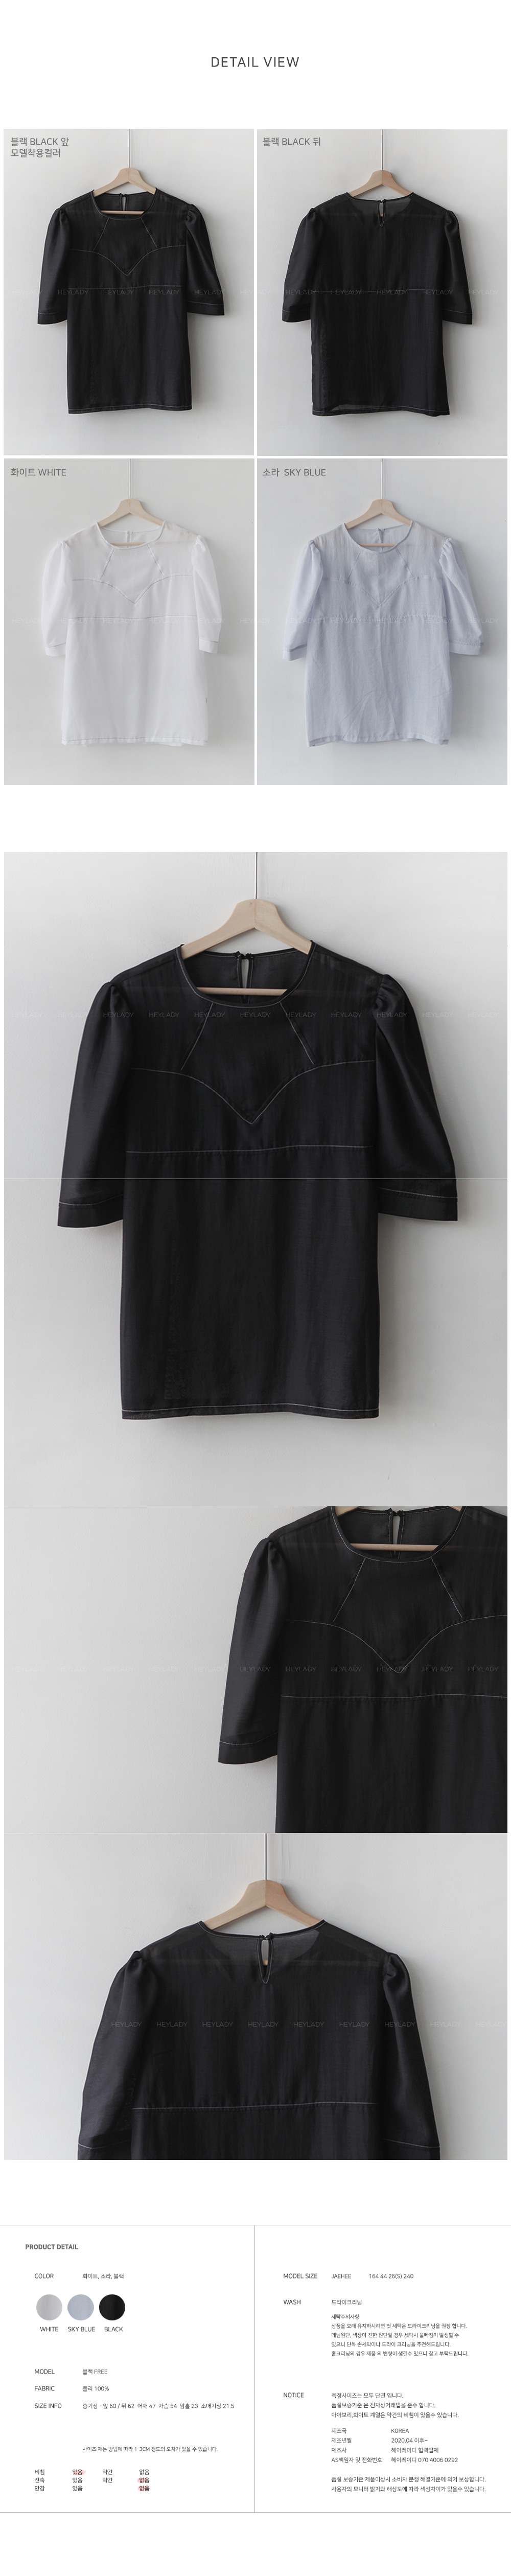 Baem stitch blouse